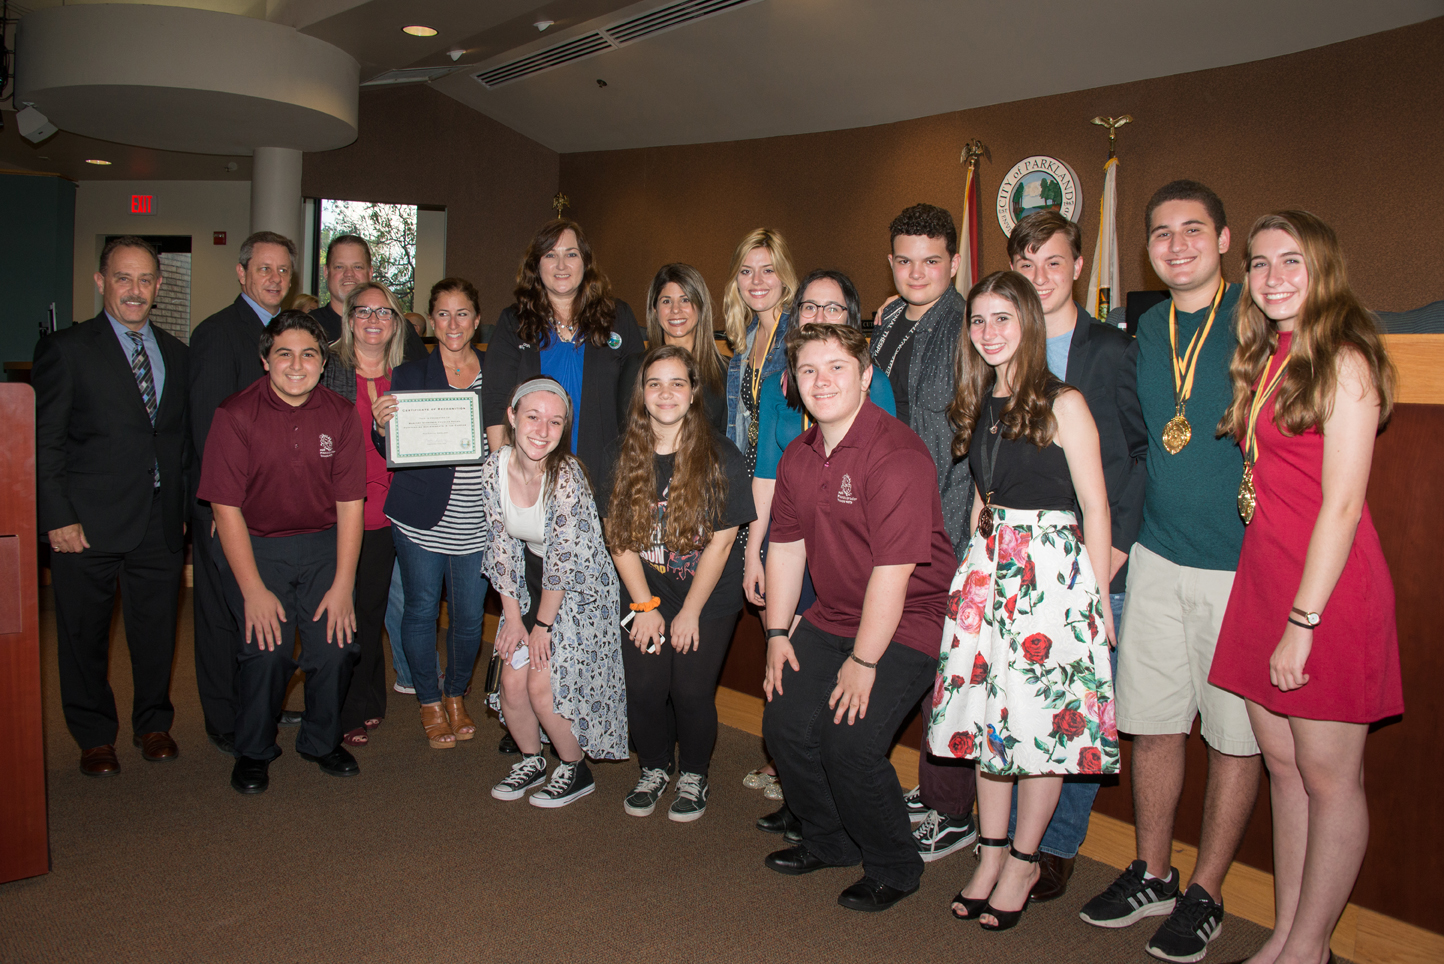 Stoneman Douglas Drama Students Recognized For Cappies